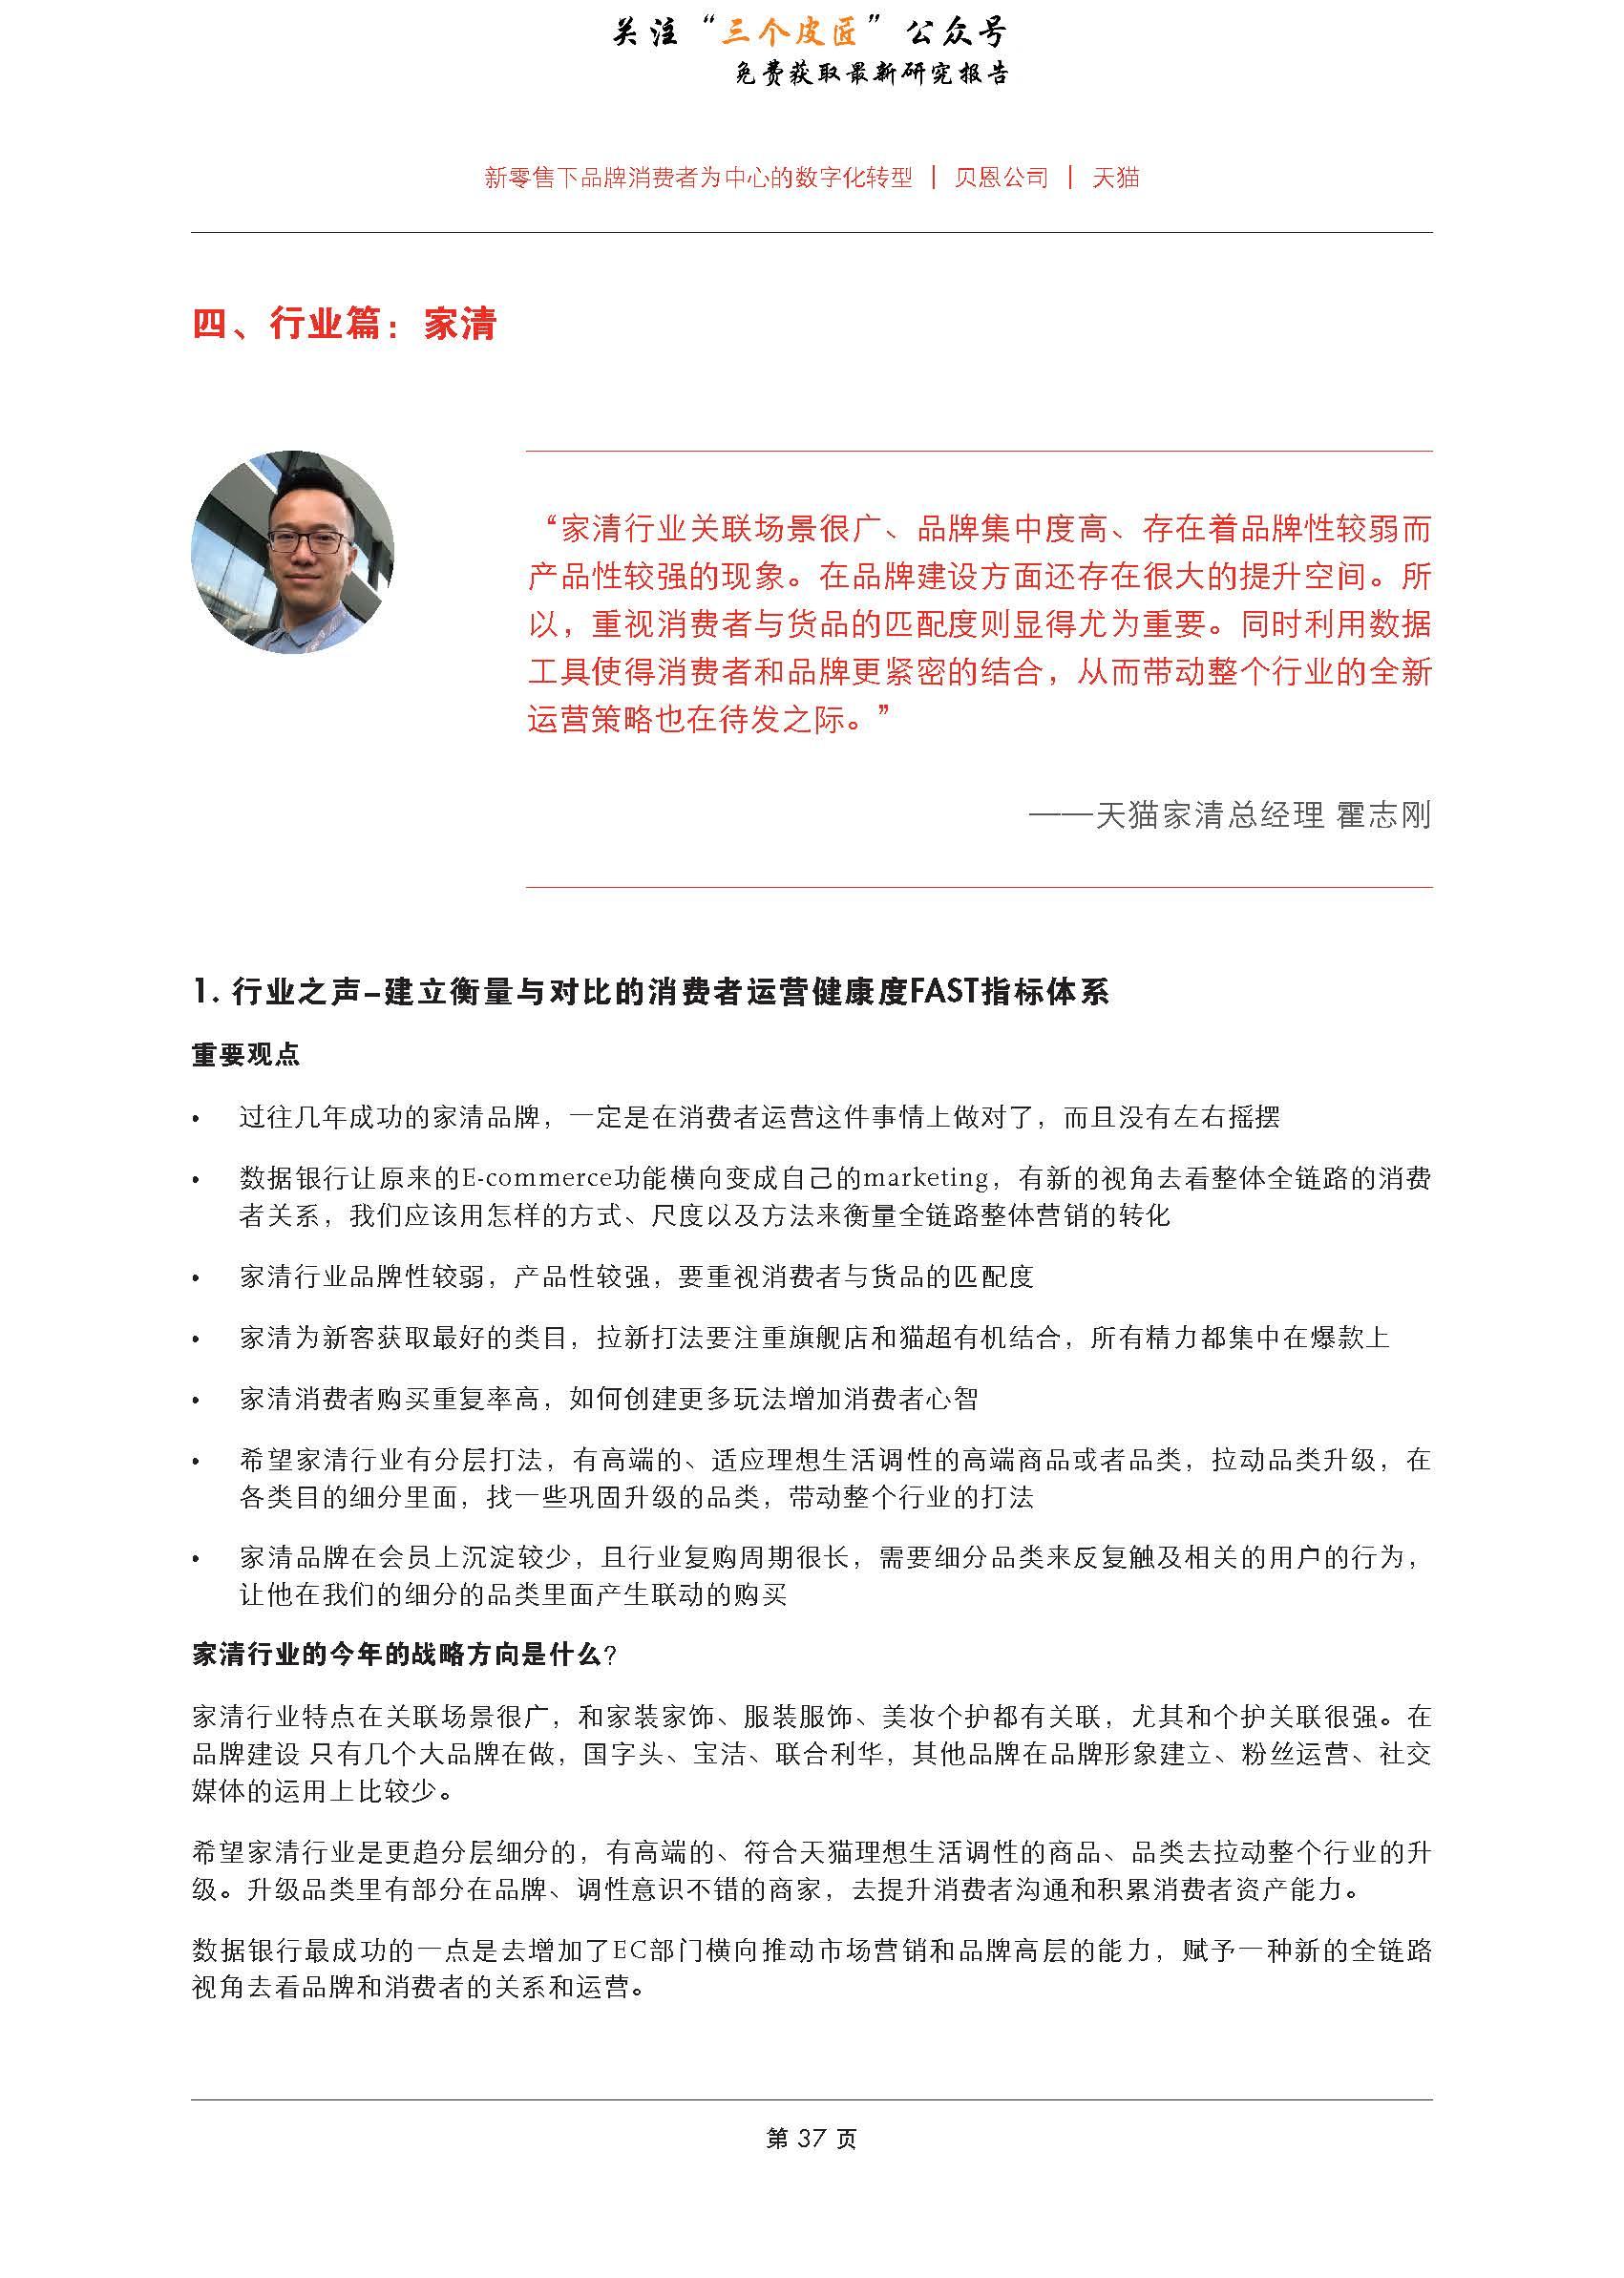 1_Page_39.jpg